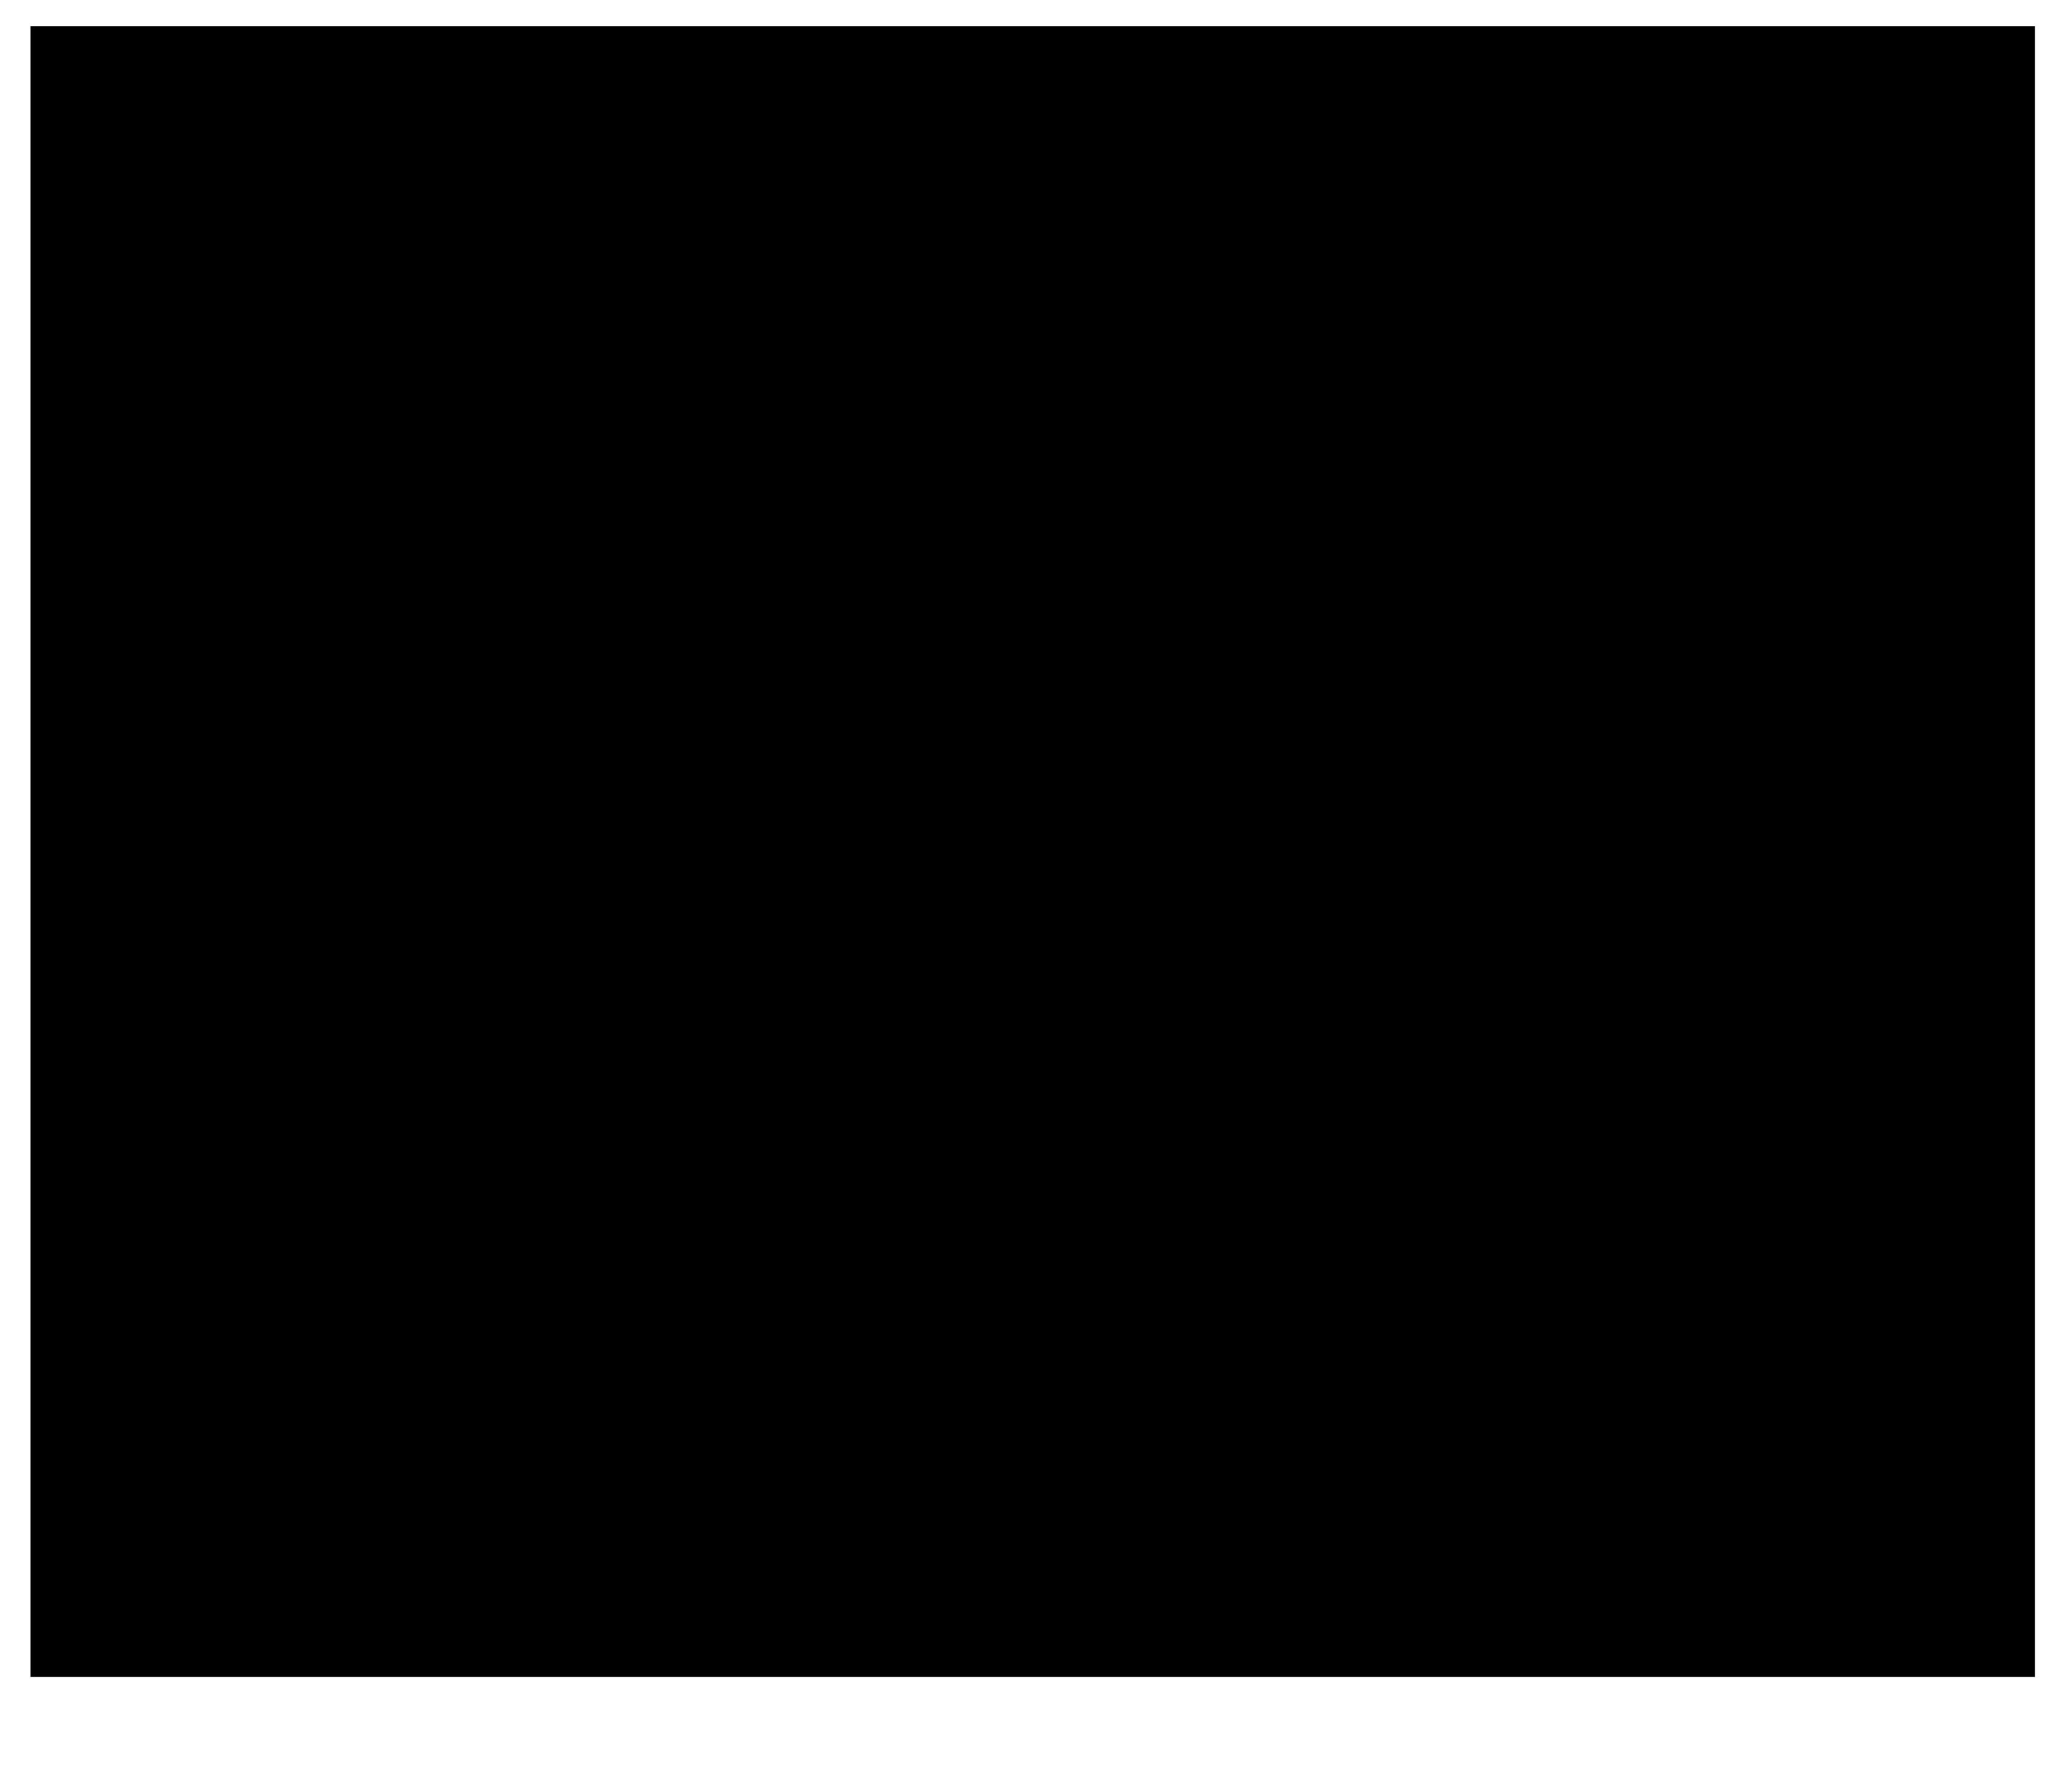 Sidewall & Tread Cutter Detailed Dimensions 03